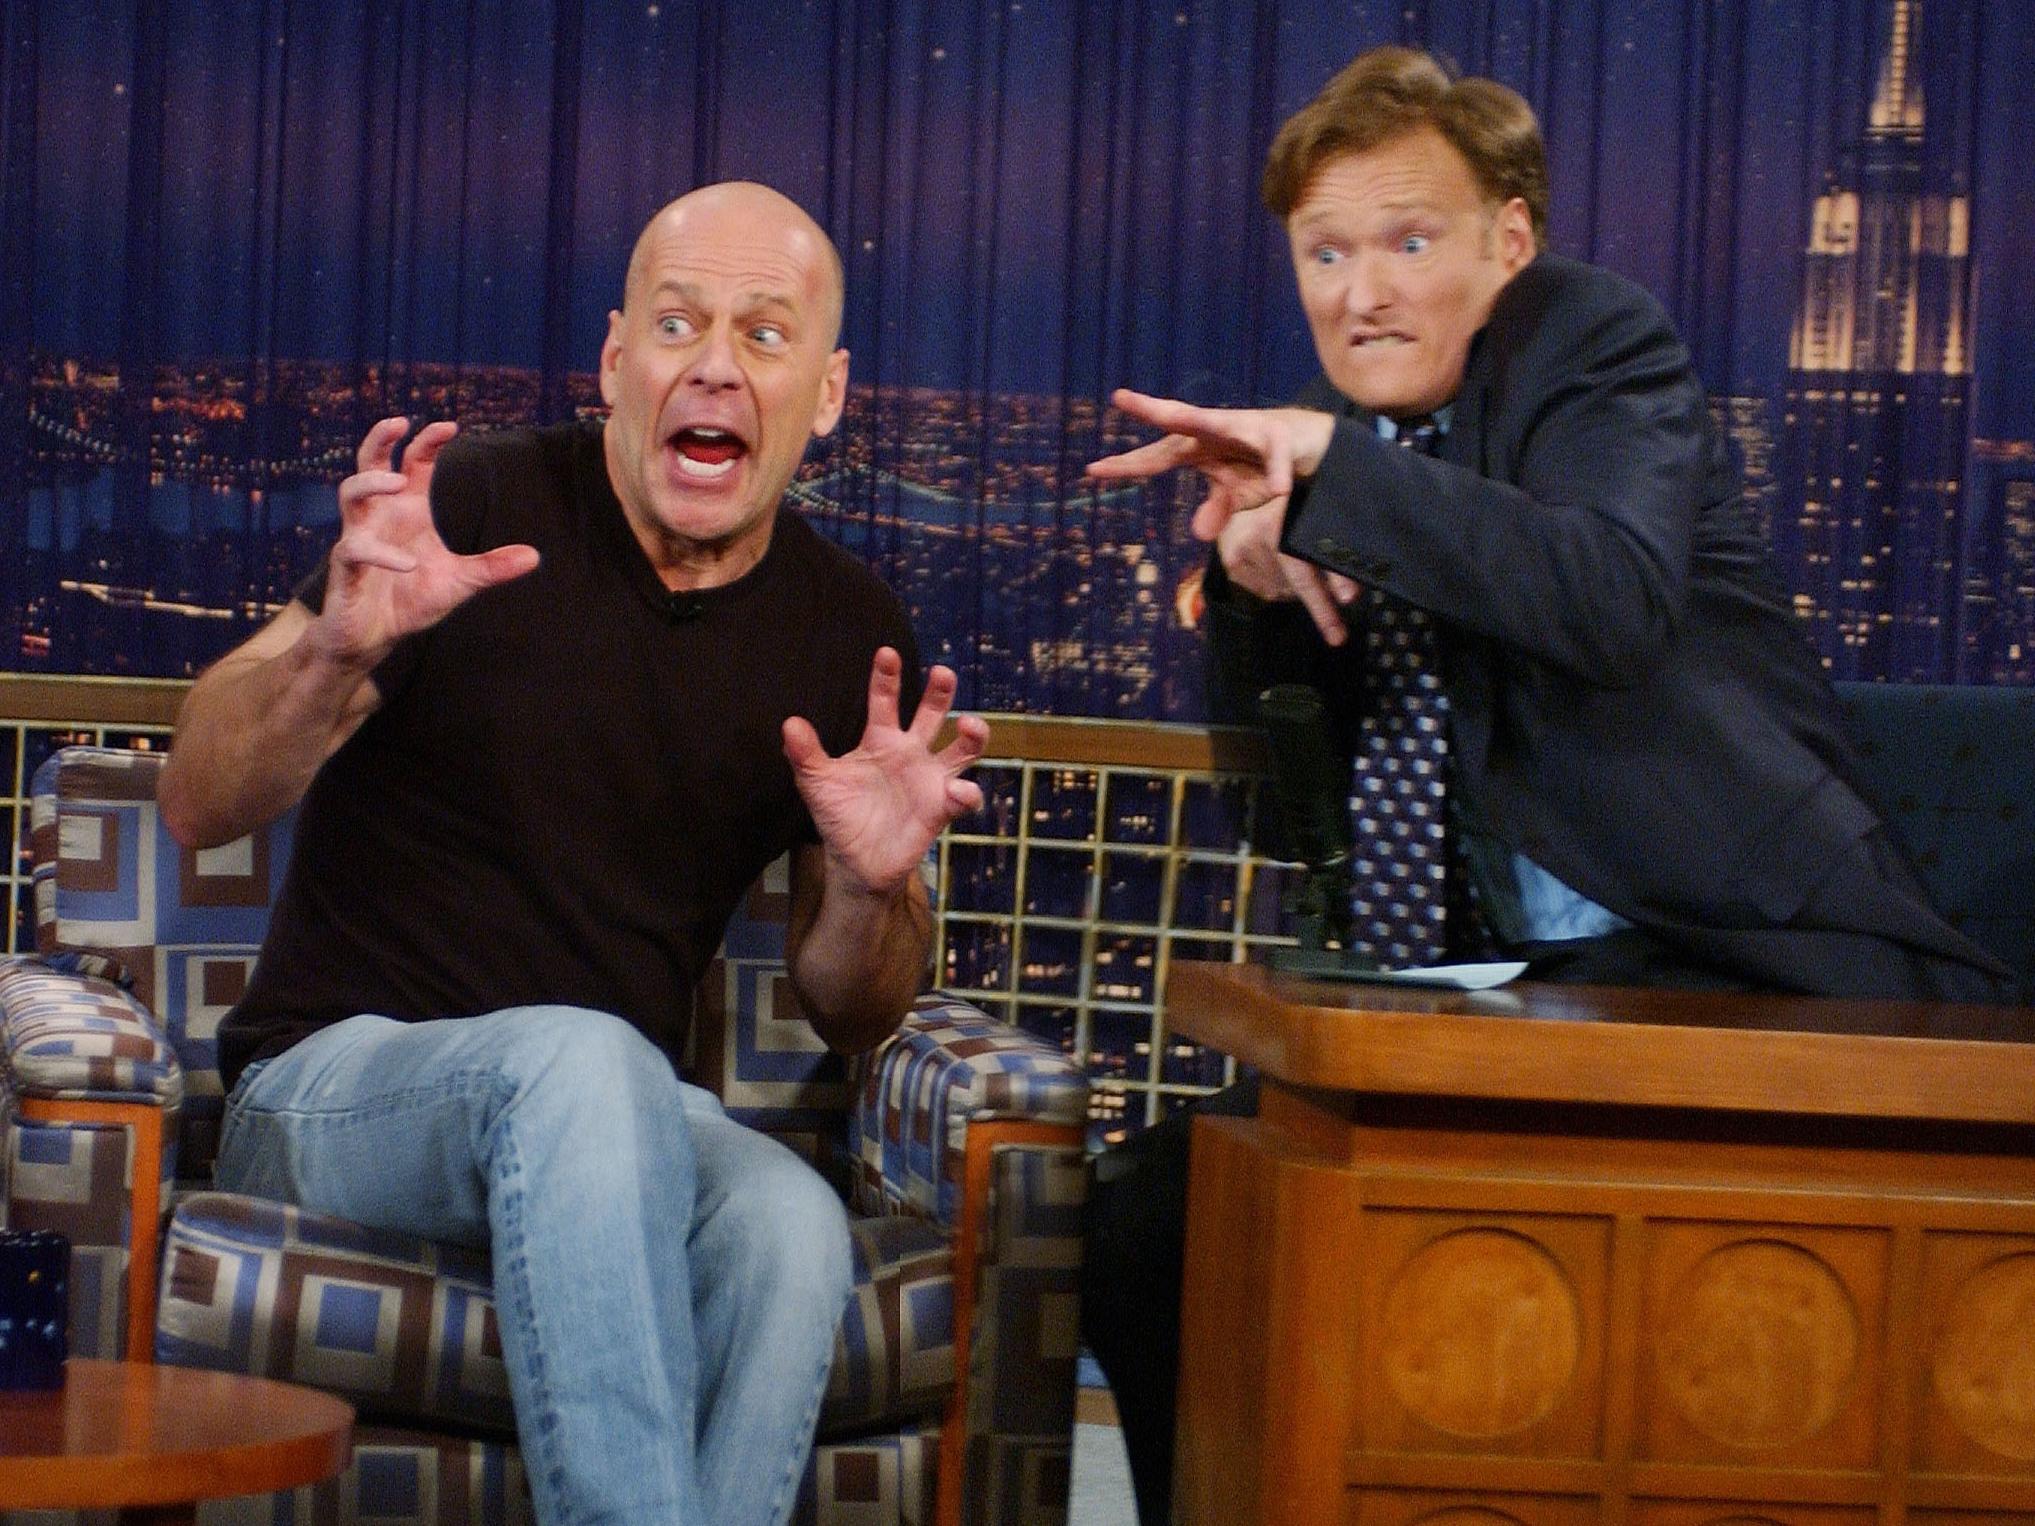 Conan's 'Uphill Climb' To Late-Night Throne